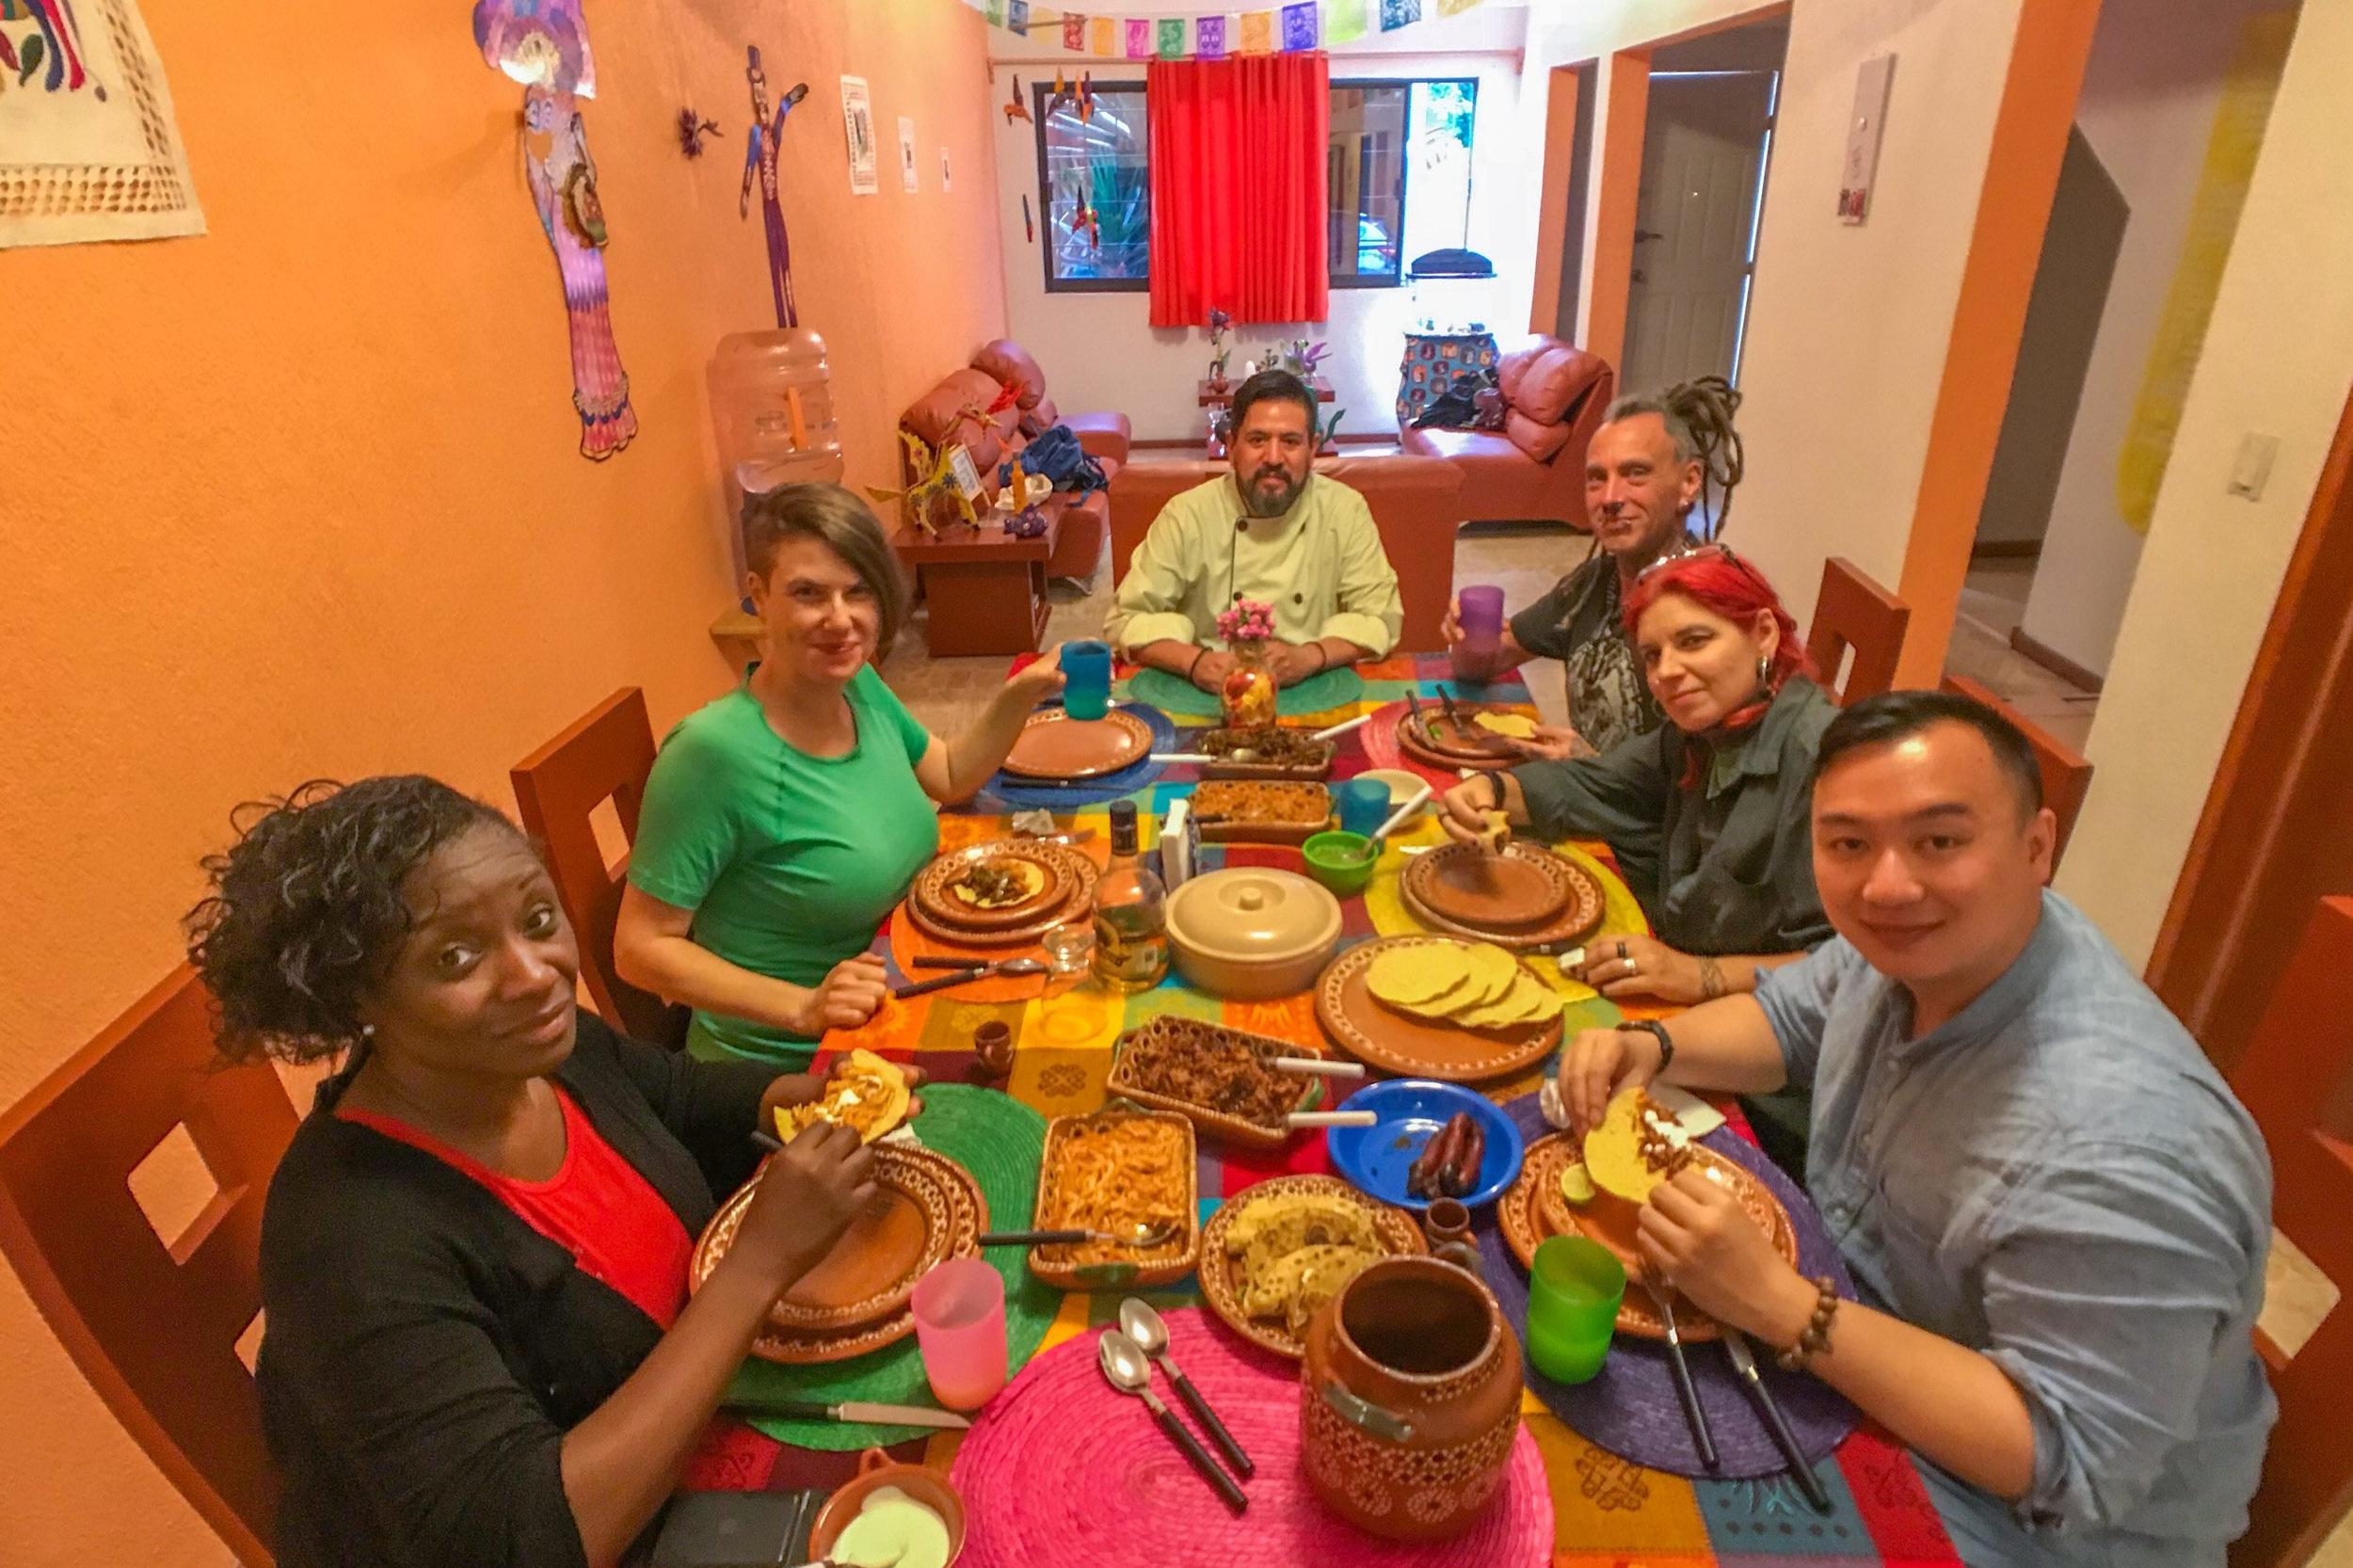 Group_Trip_Mexico.JPEG